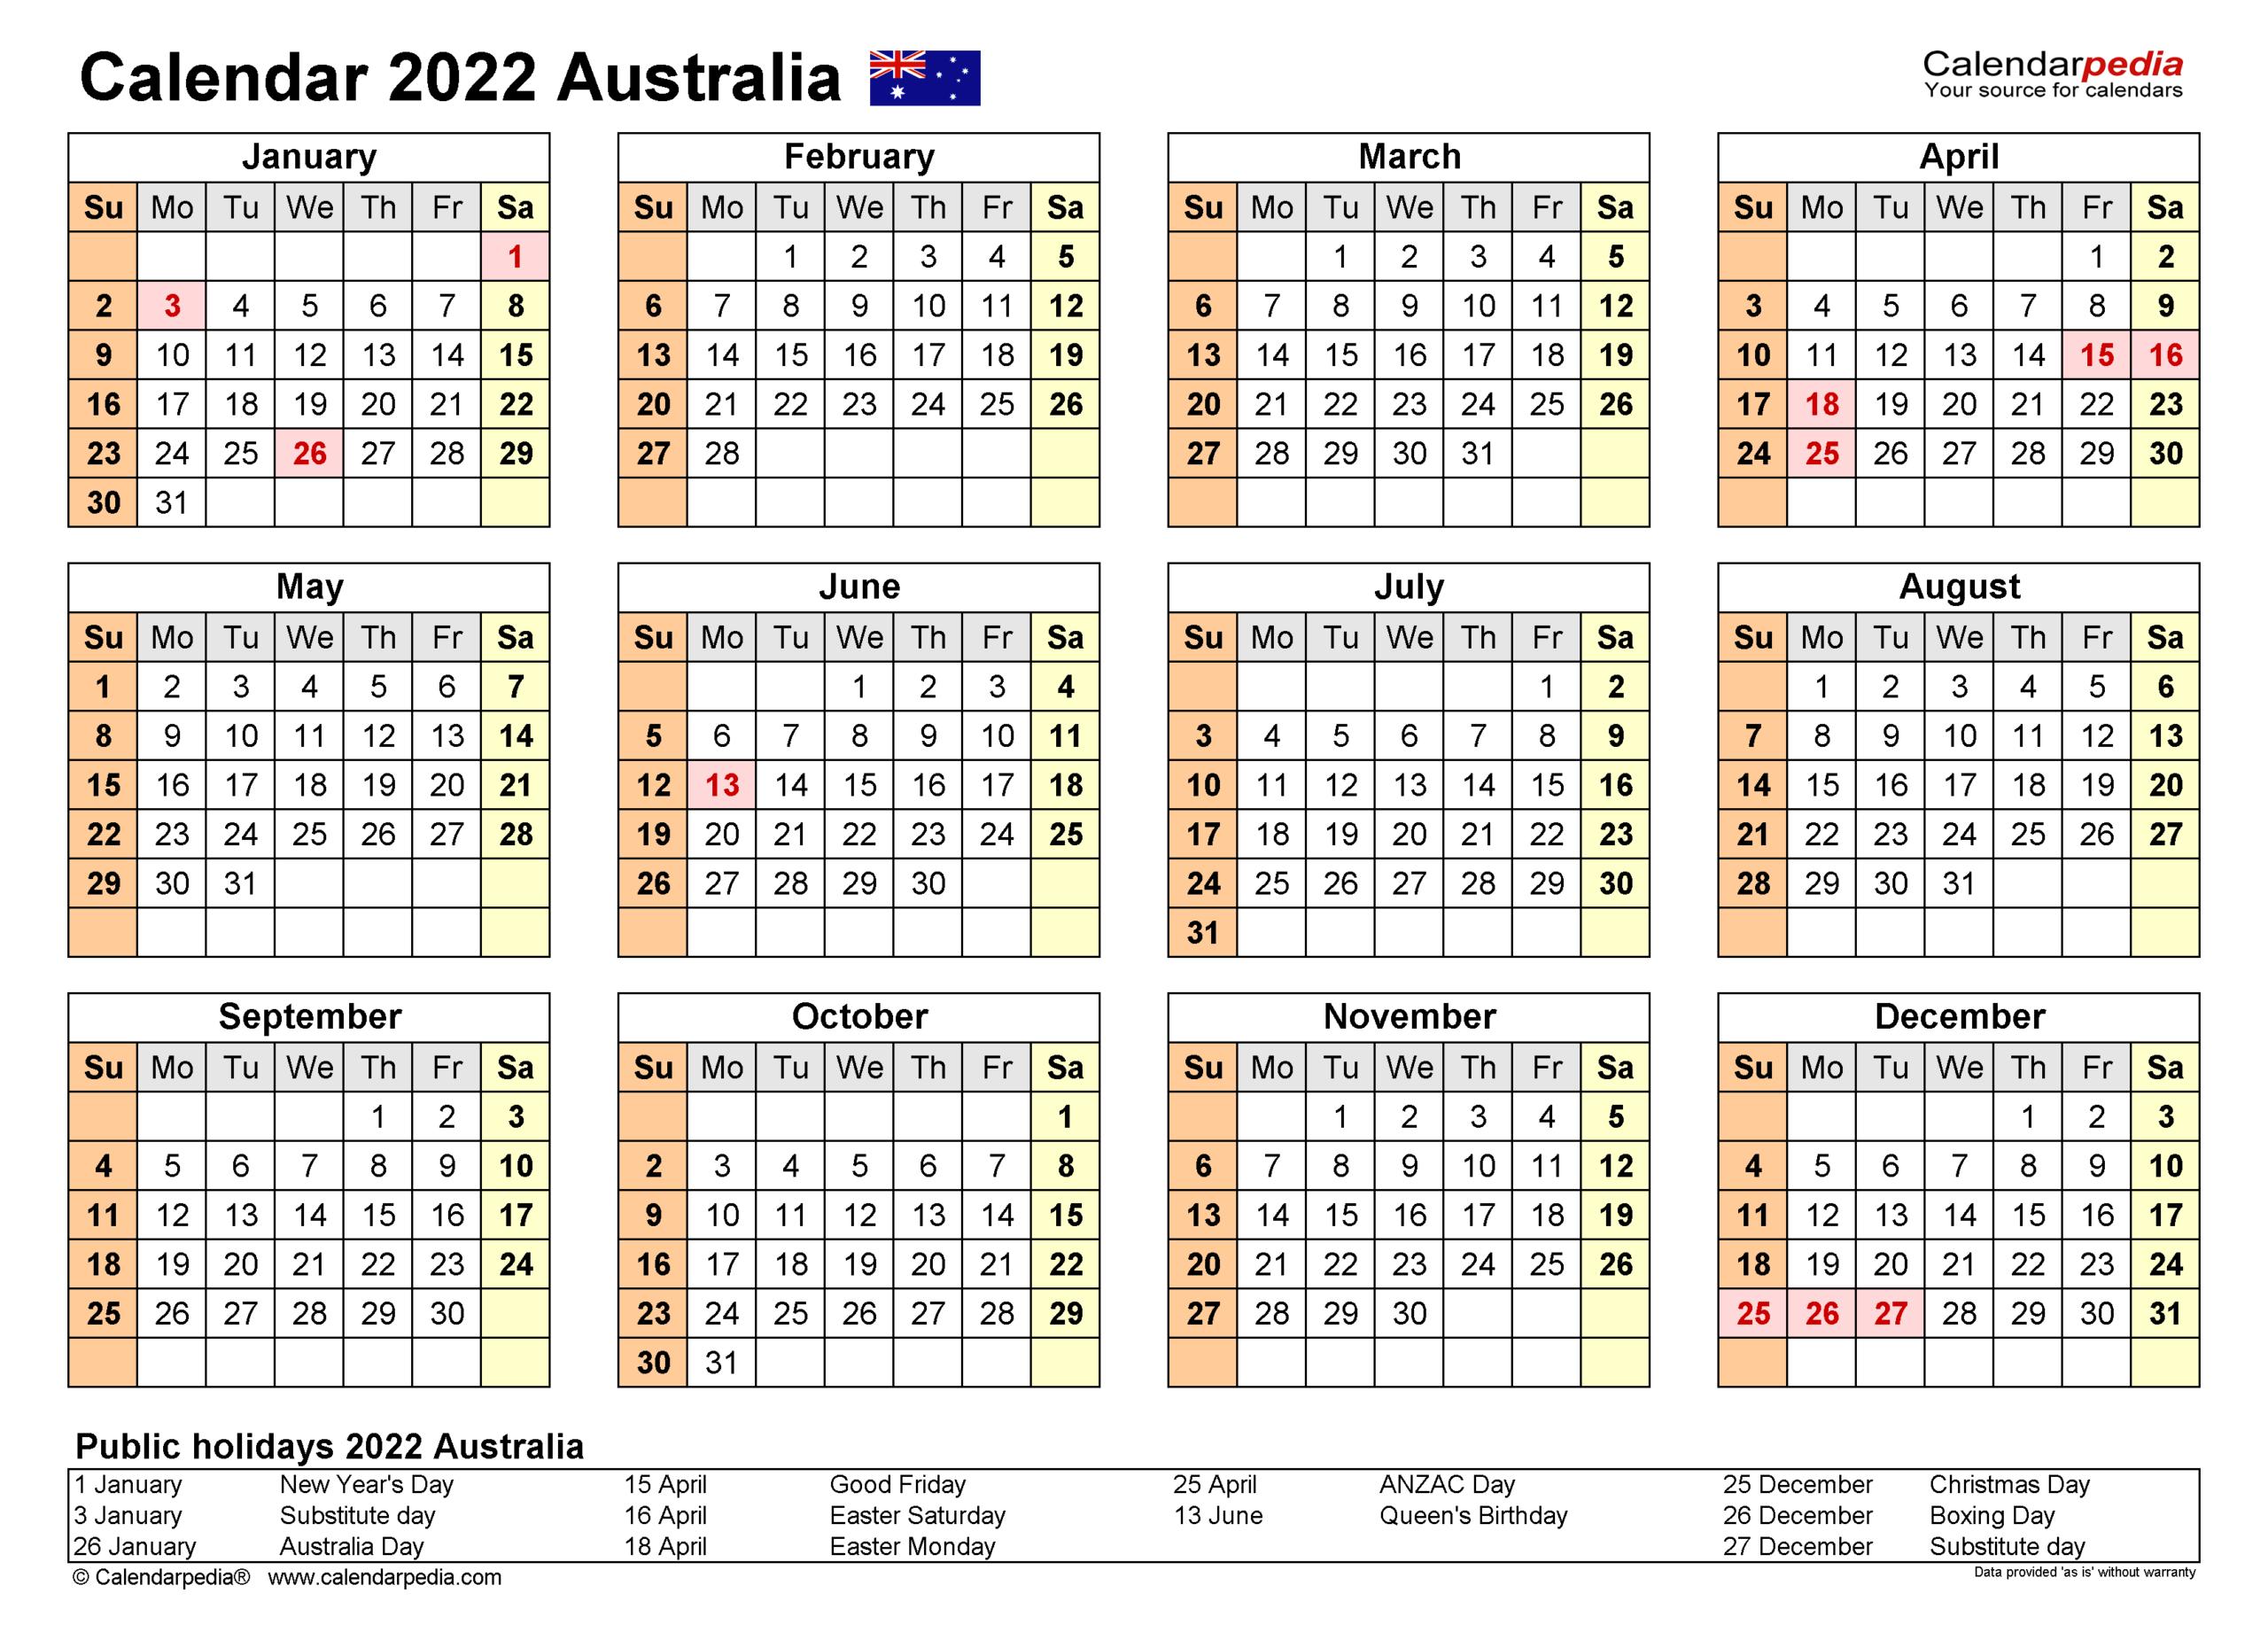 Uri Calendar 2022.Australia Calendar 2022 Free Printable Excel Templates In 2021 2022 Three Year Planner 3 Y In 2021 Calendar Australia Holiday Calendar Printable Calendar Template